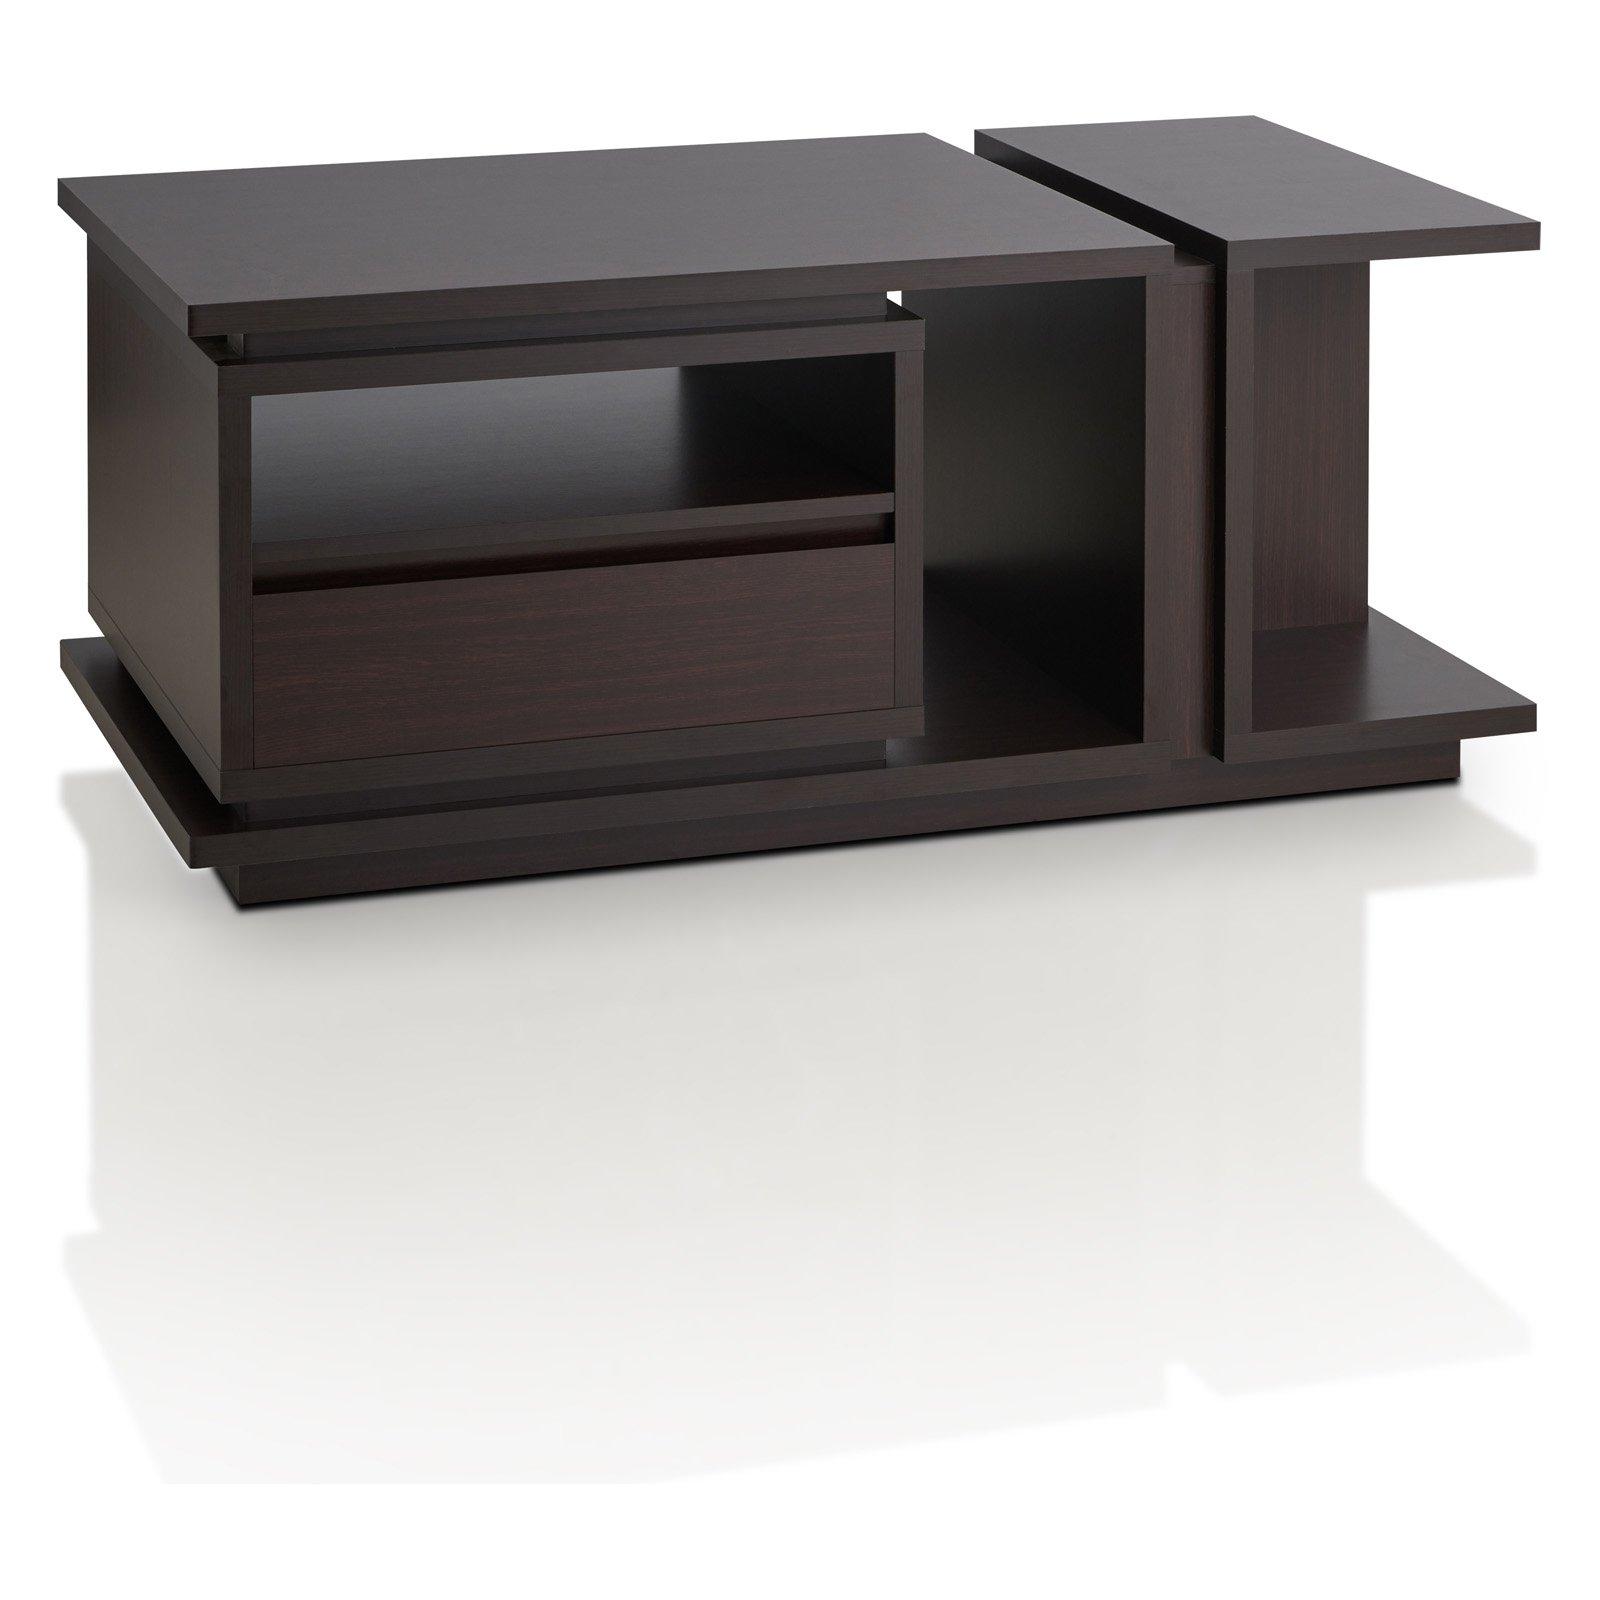 Furniture of America Jernie Coffee Table